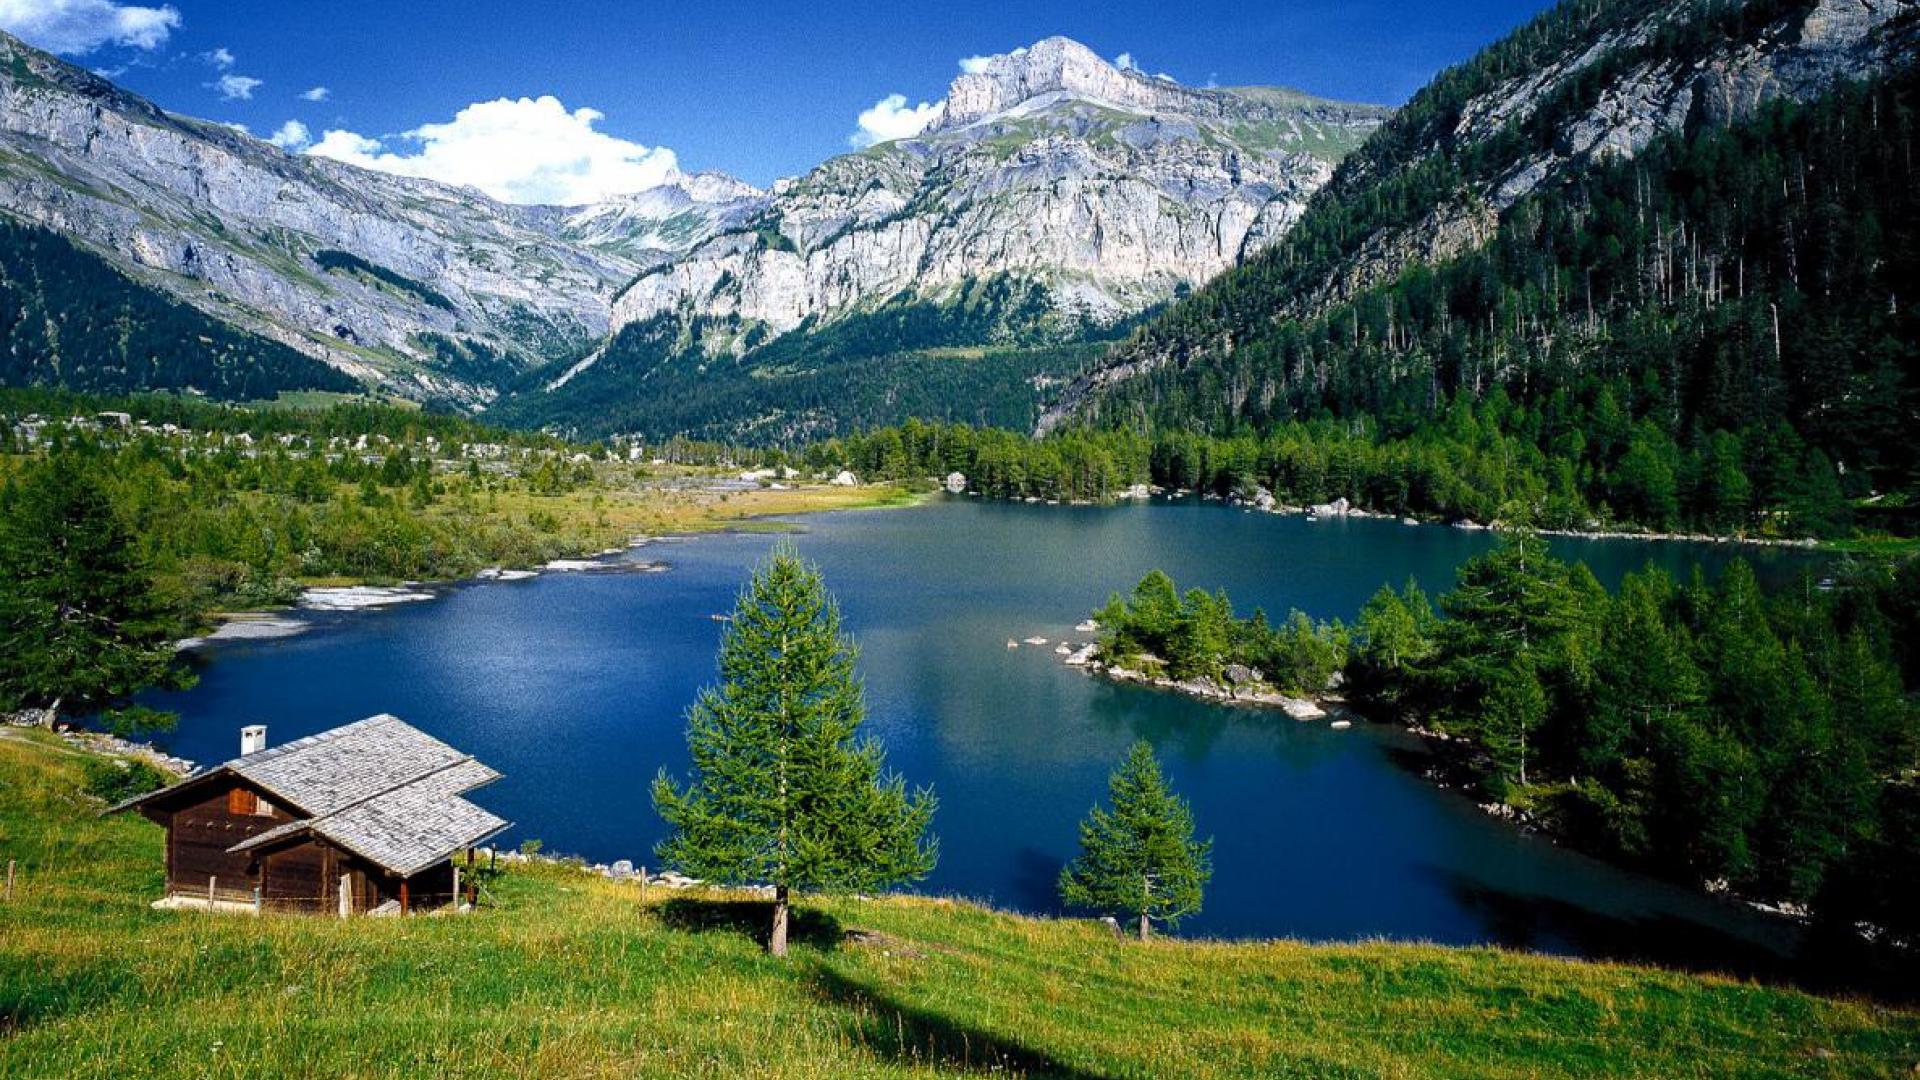 SWITZERLAND DREAMS